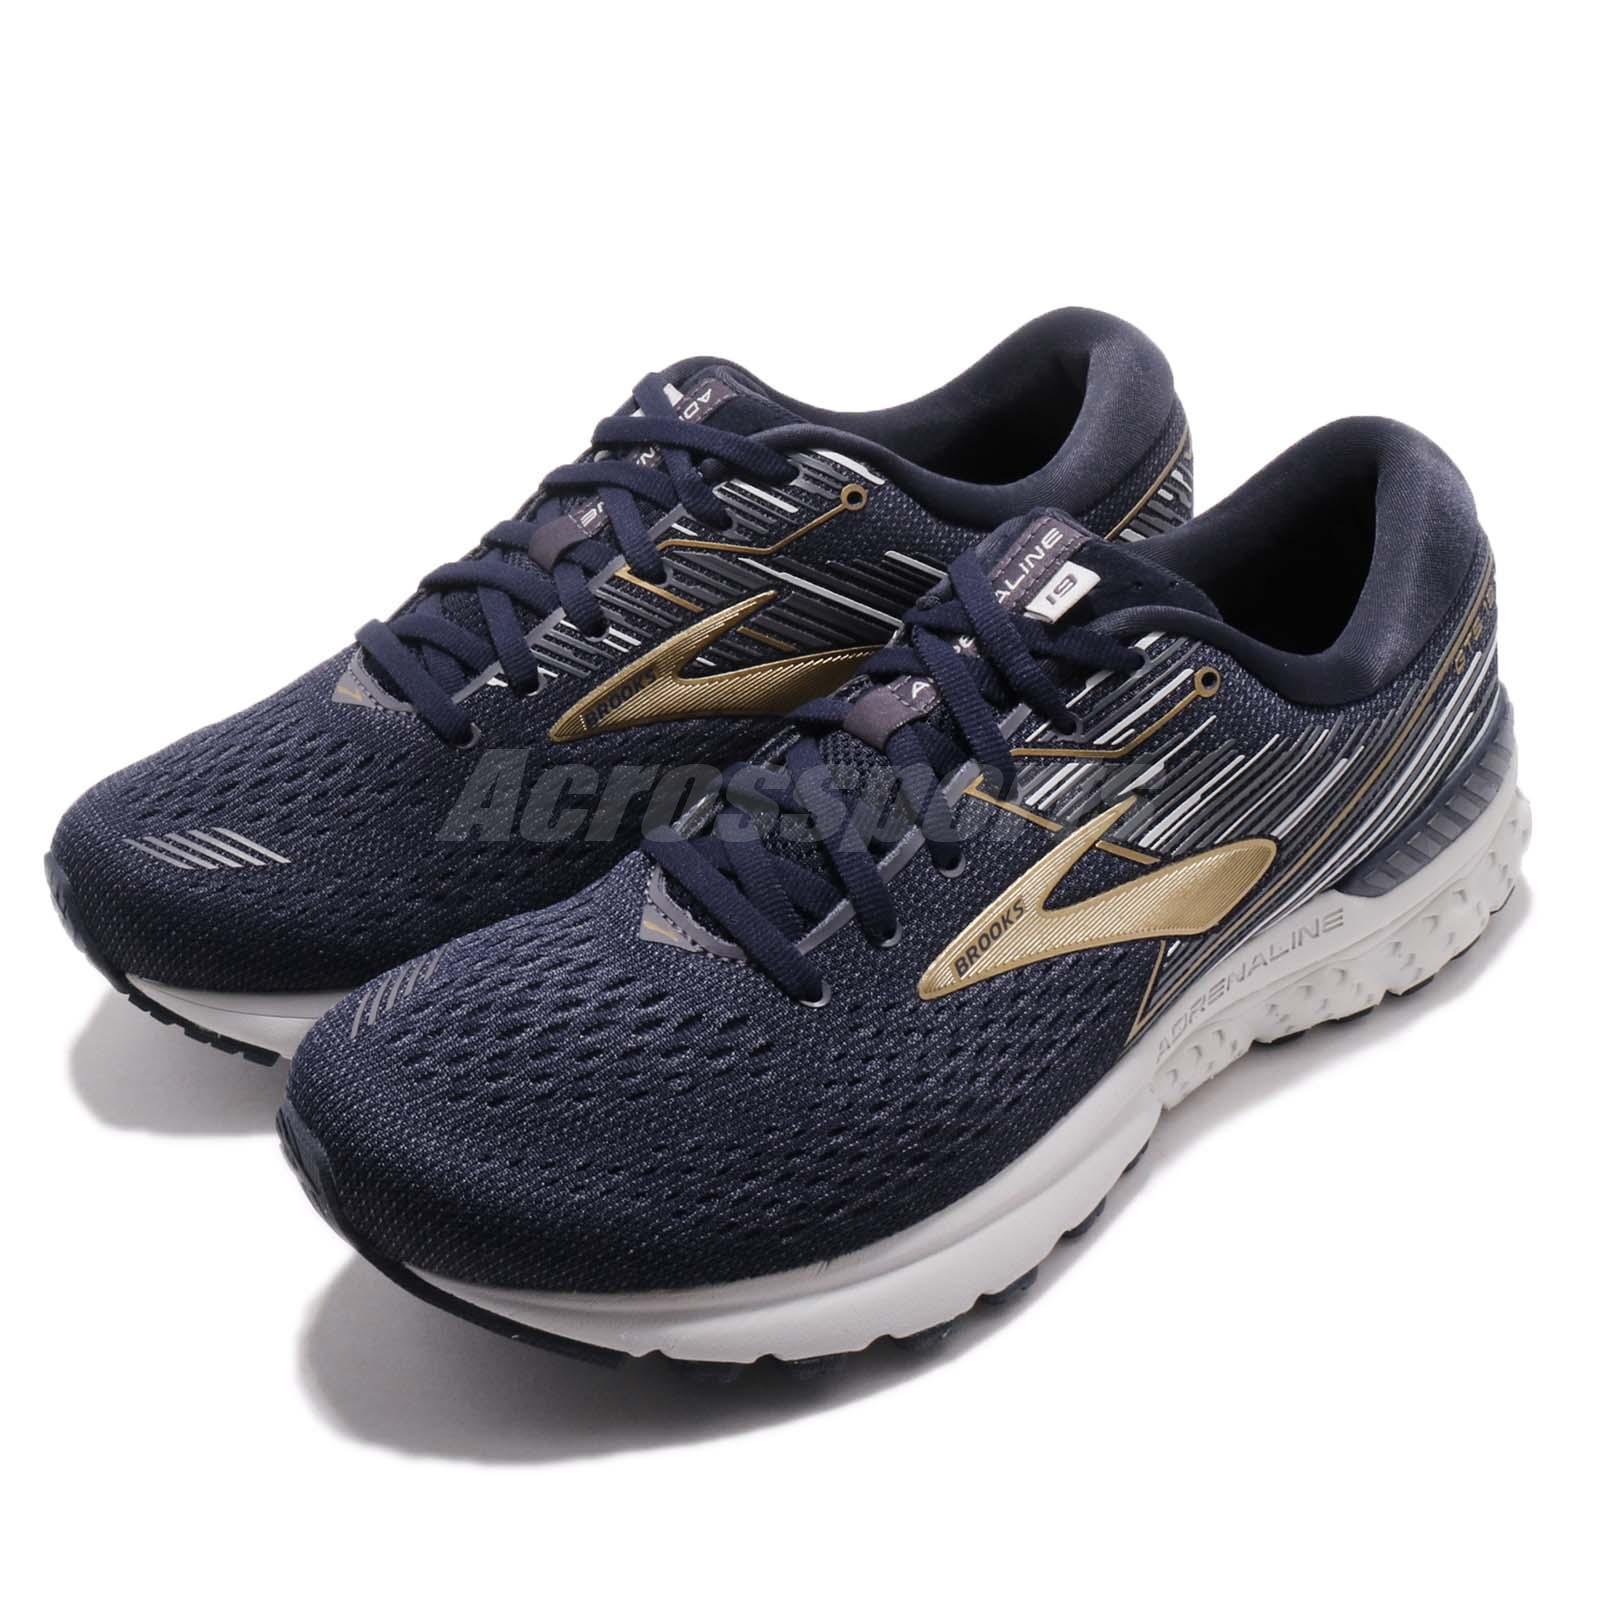 98cf6424f85 Details about Brooks Adrenaline GTS 19 2E Wide Navy Gold Grey Men Running  Shoes 110294 2E